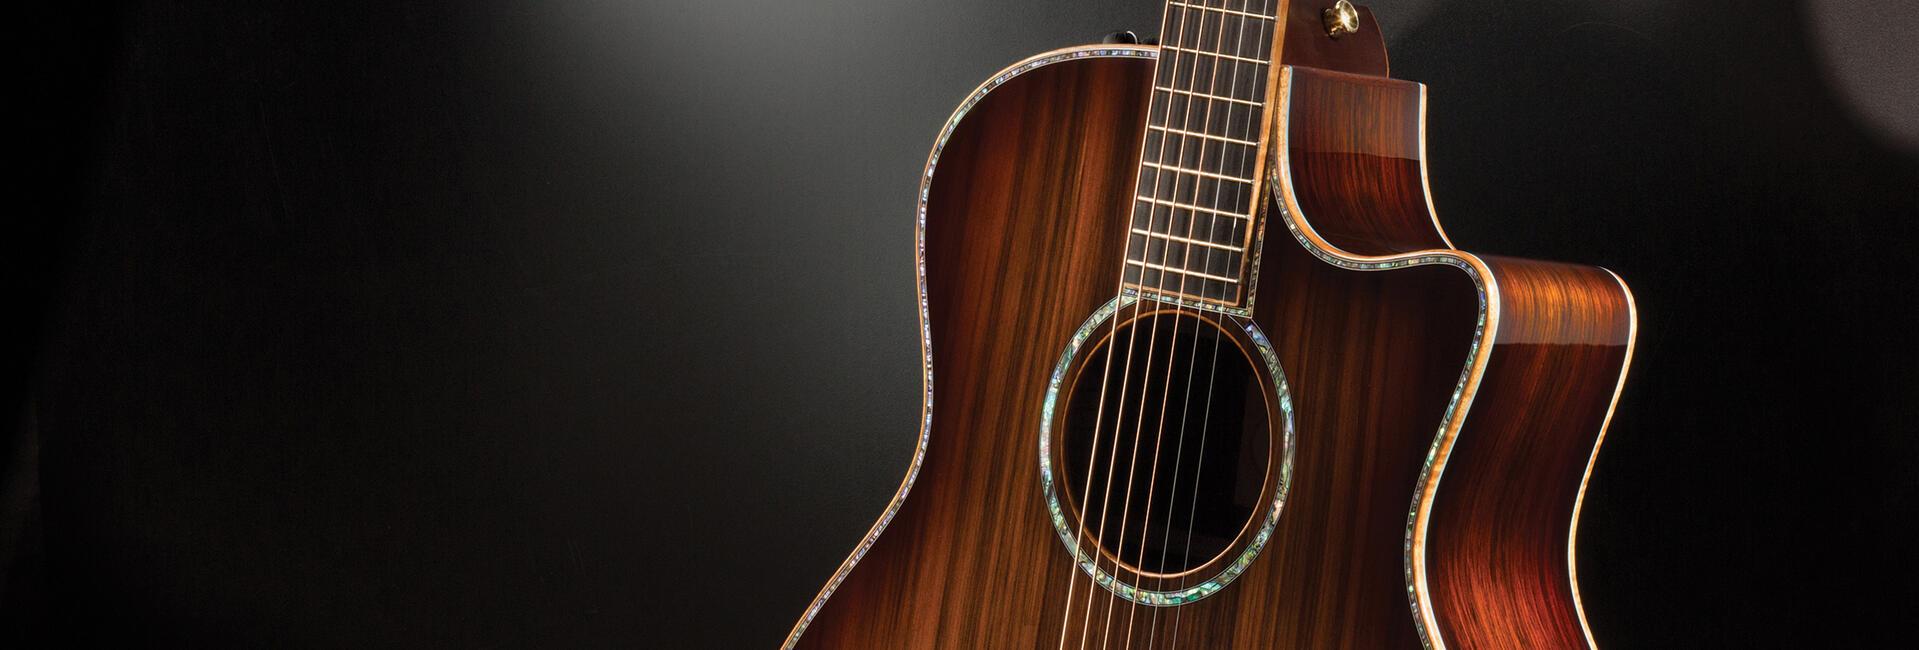 Finish | Taylor Guitars